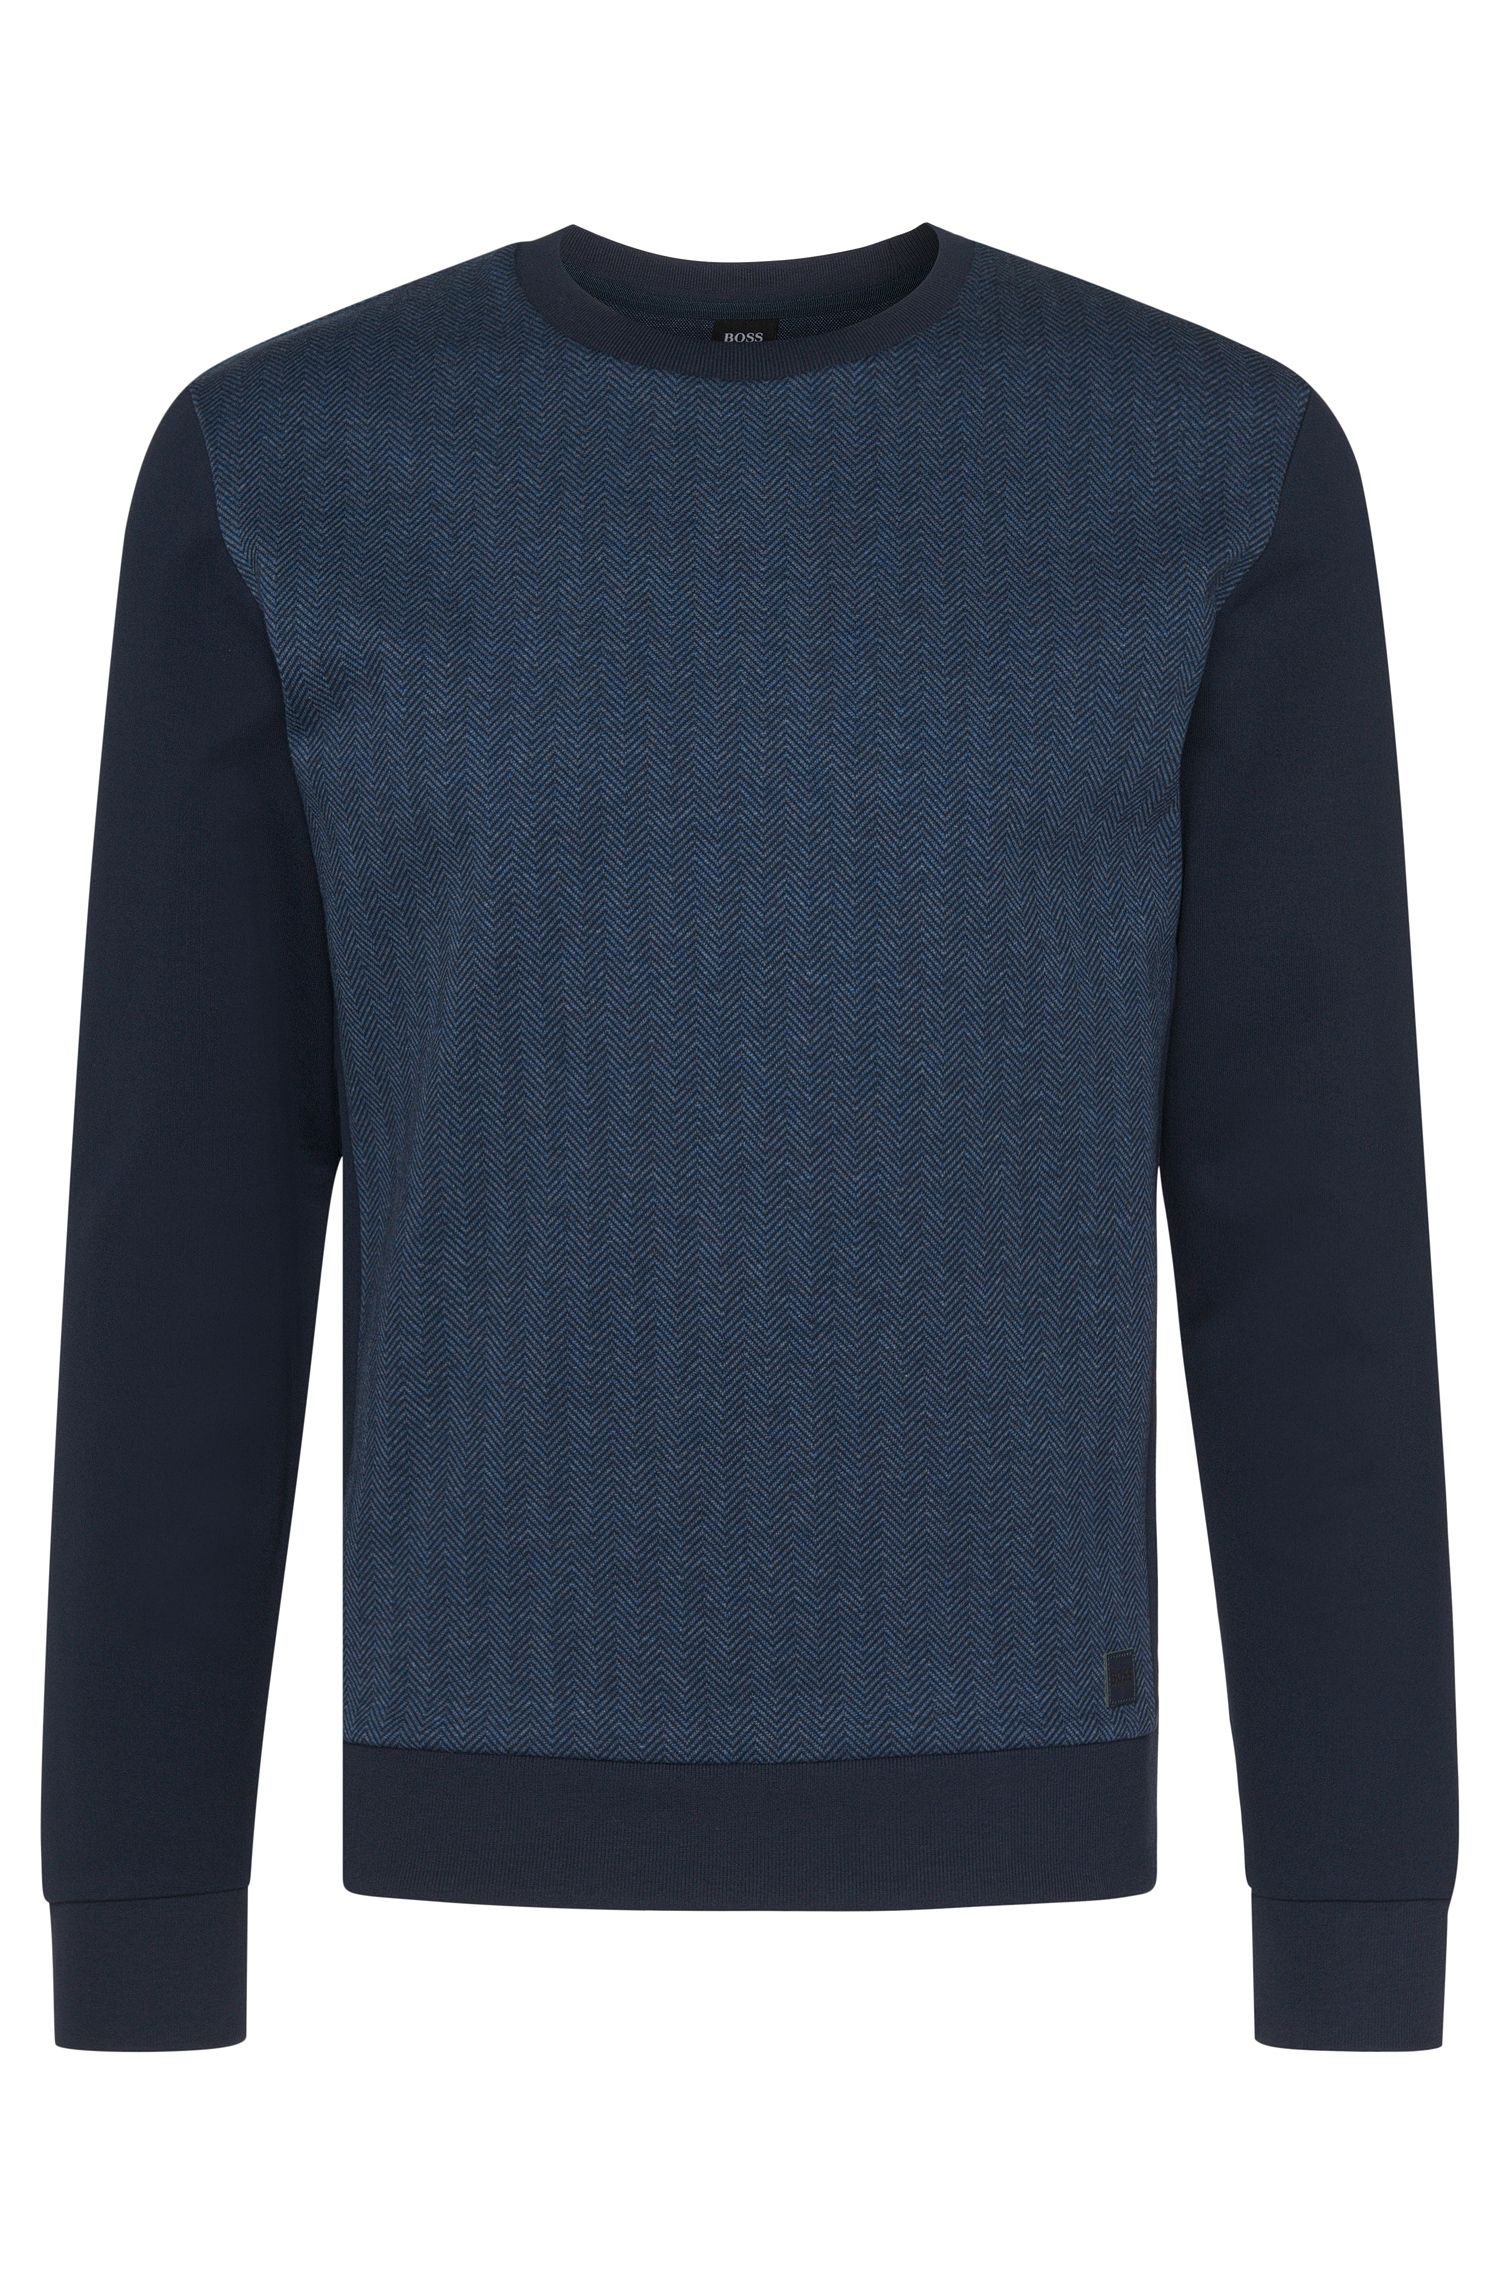 Cotton Herringbone Print Sweatshirt | Sweatshirt